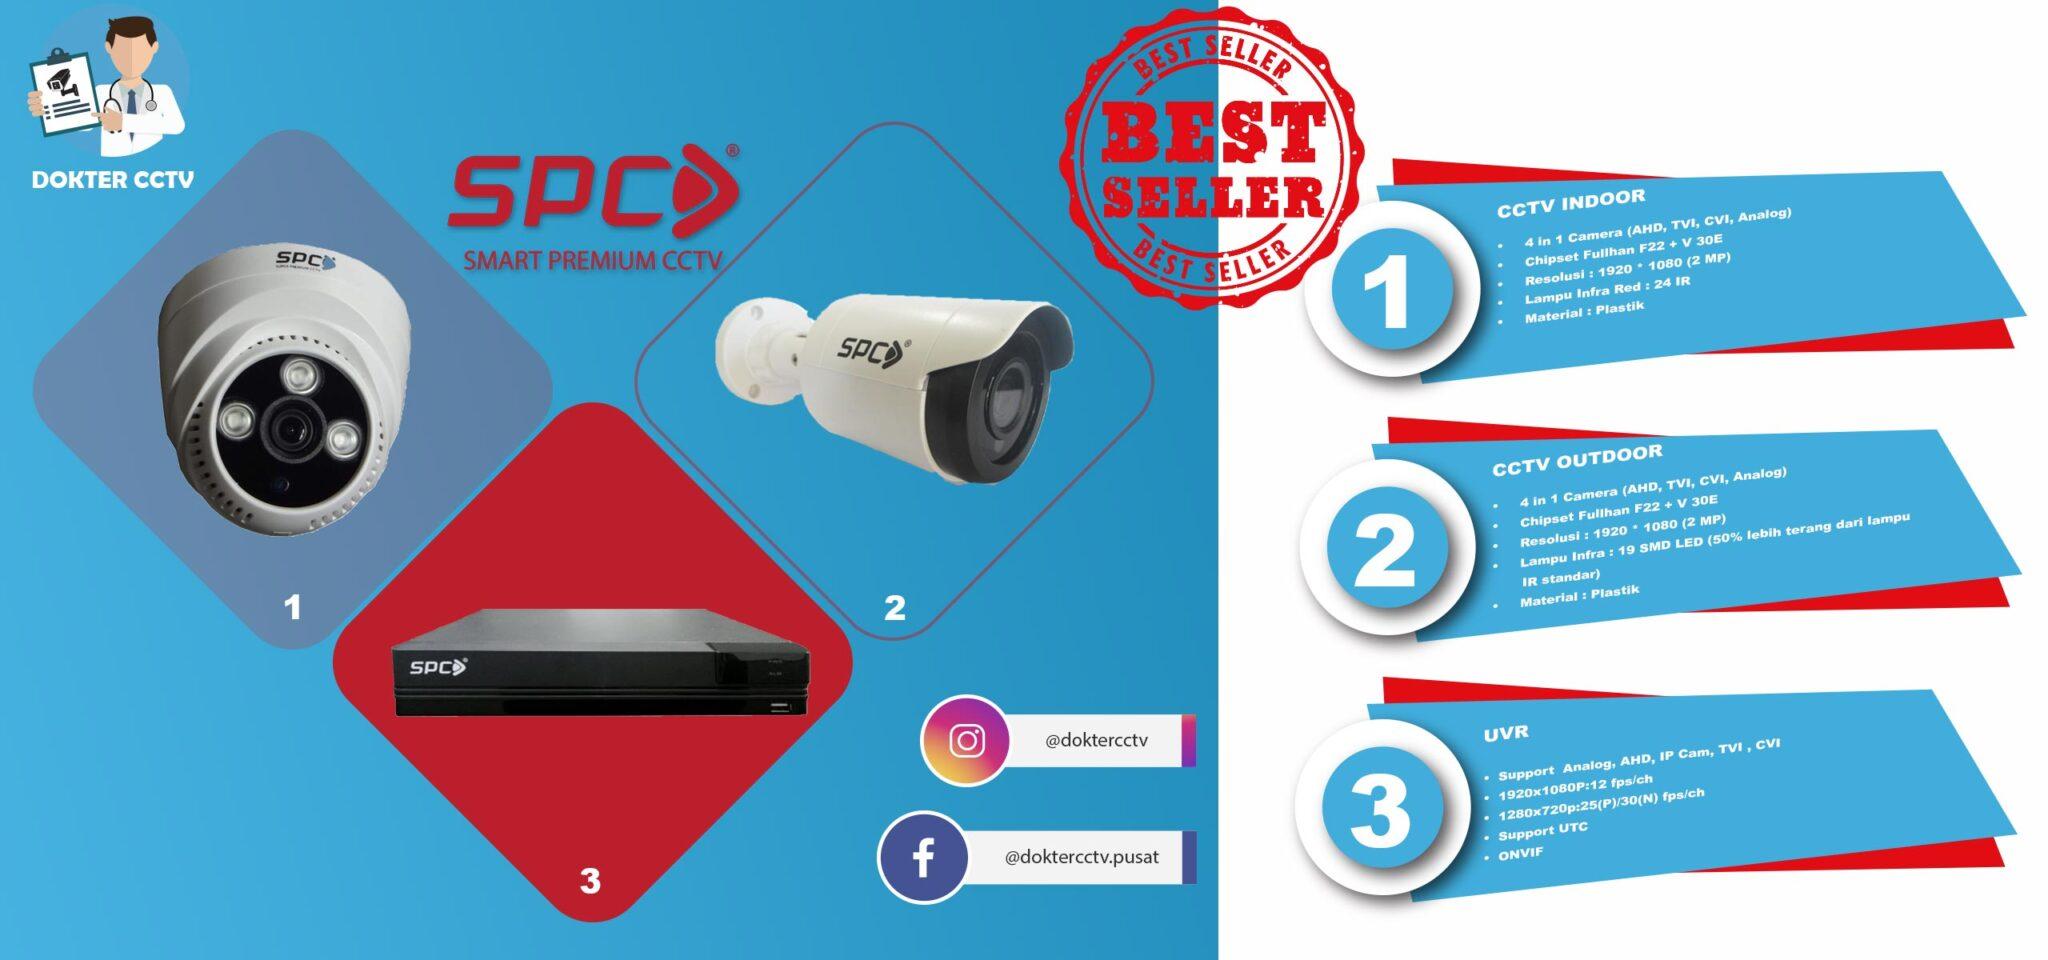 SPC - DOKTER CCTV